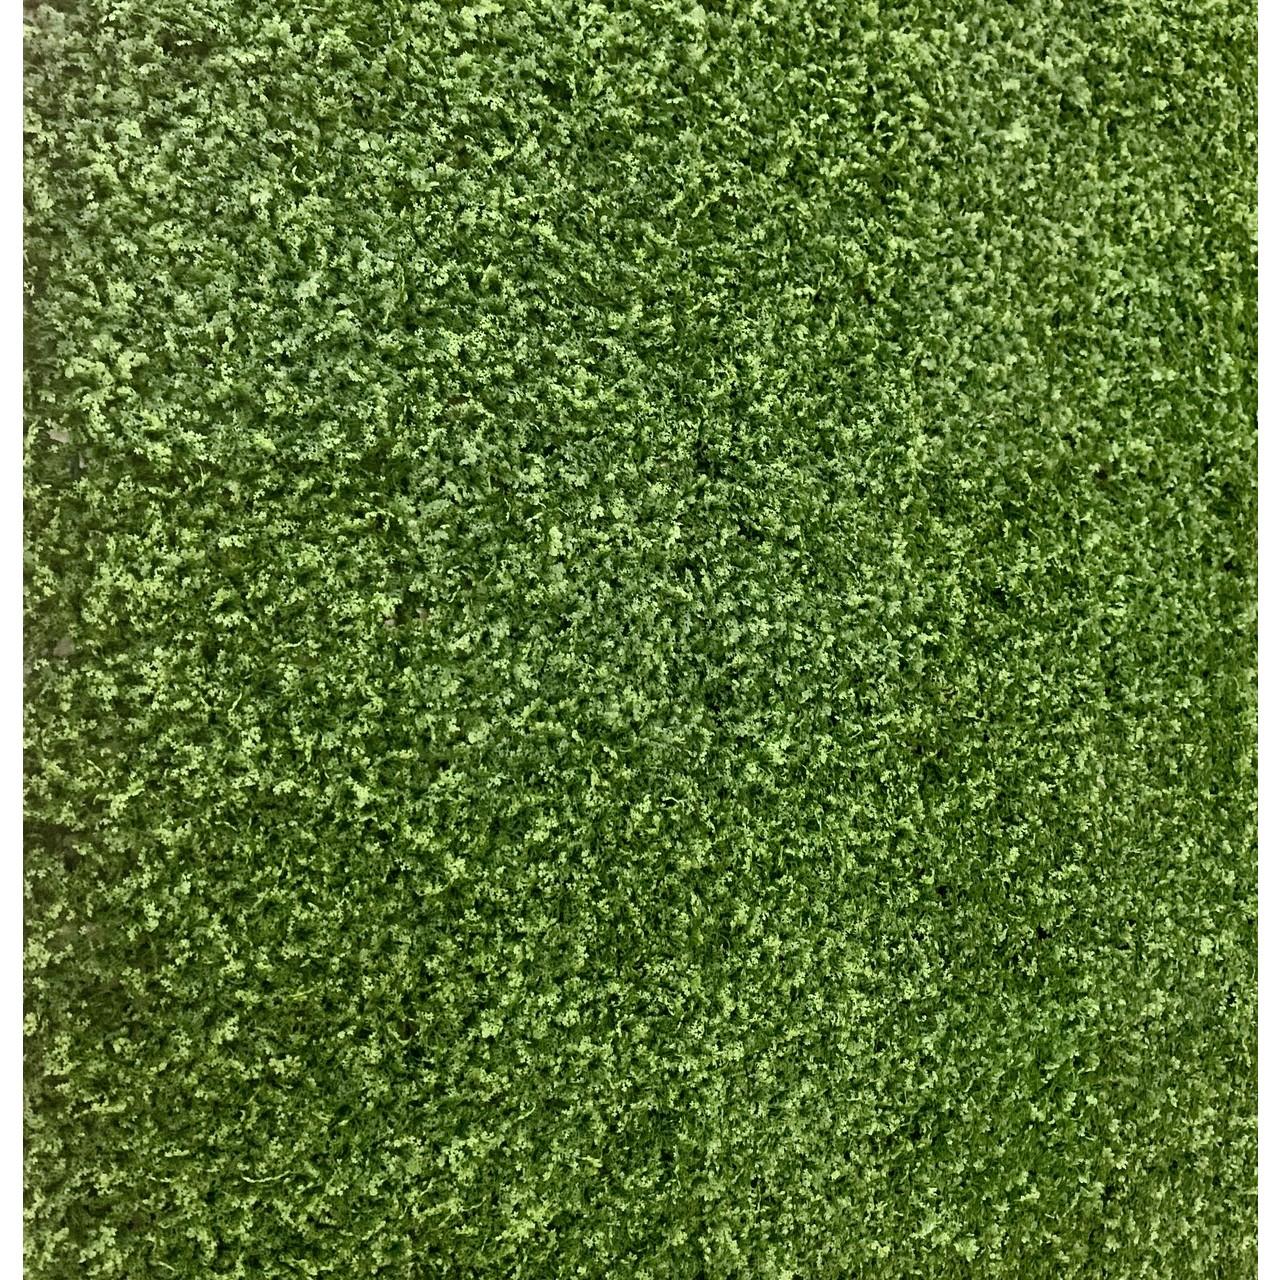 Kunst Mos Medium Quality (25x25 cm)